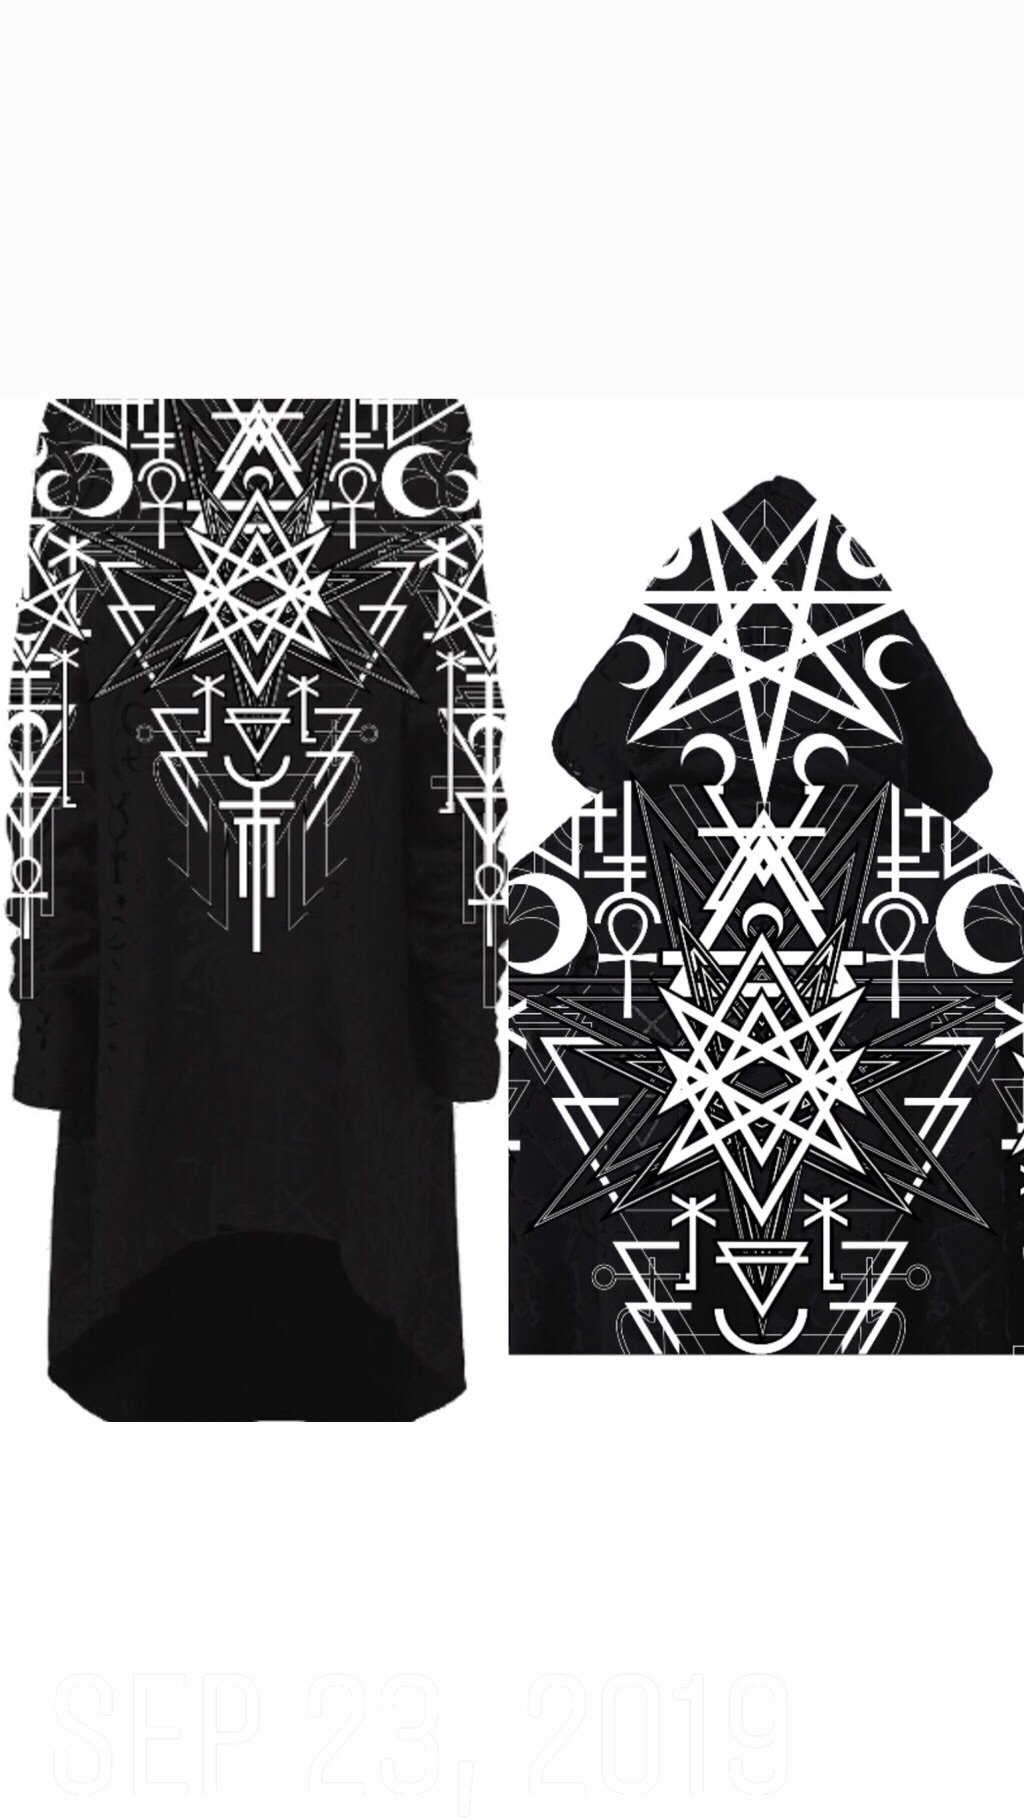 NEW! Magic Cloaks! (FREE Dark X Magic Bag) - thedarkarts